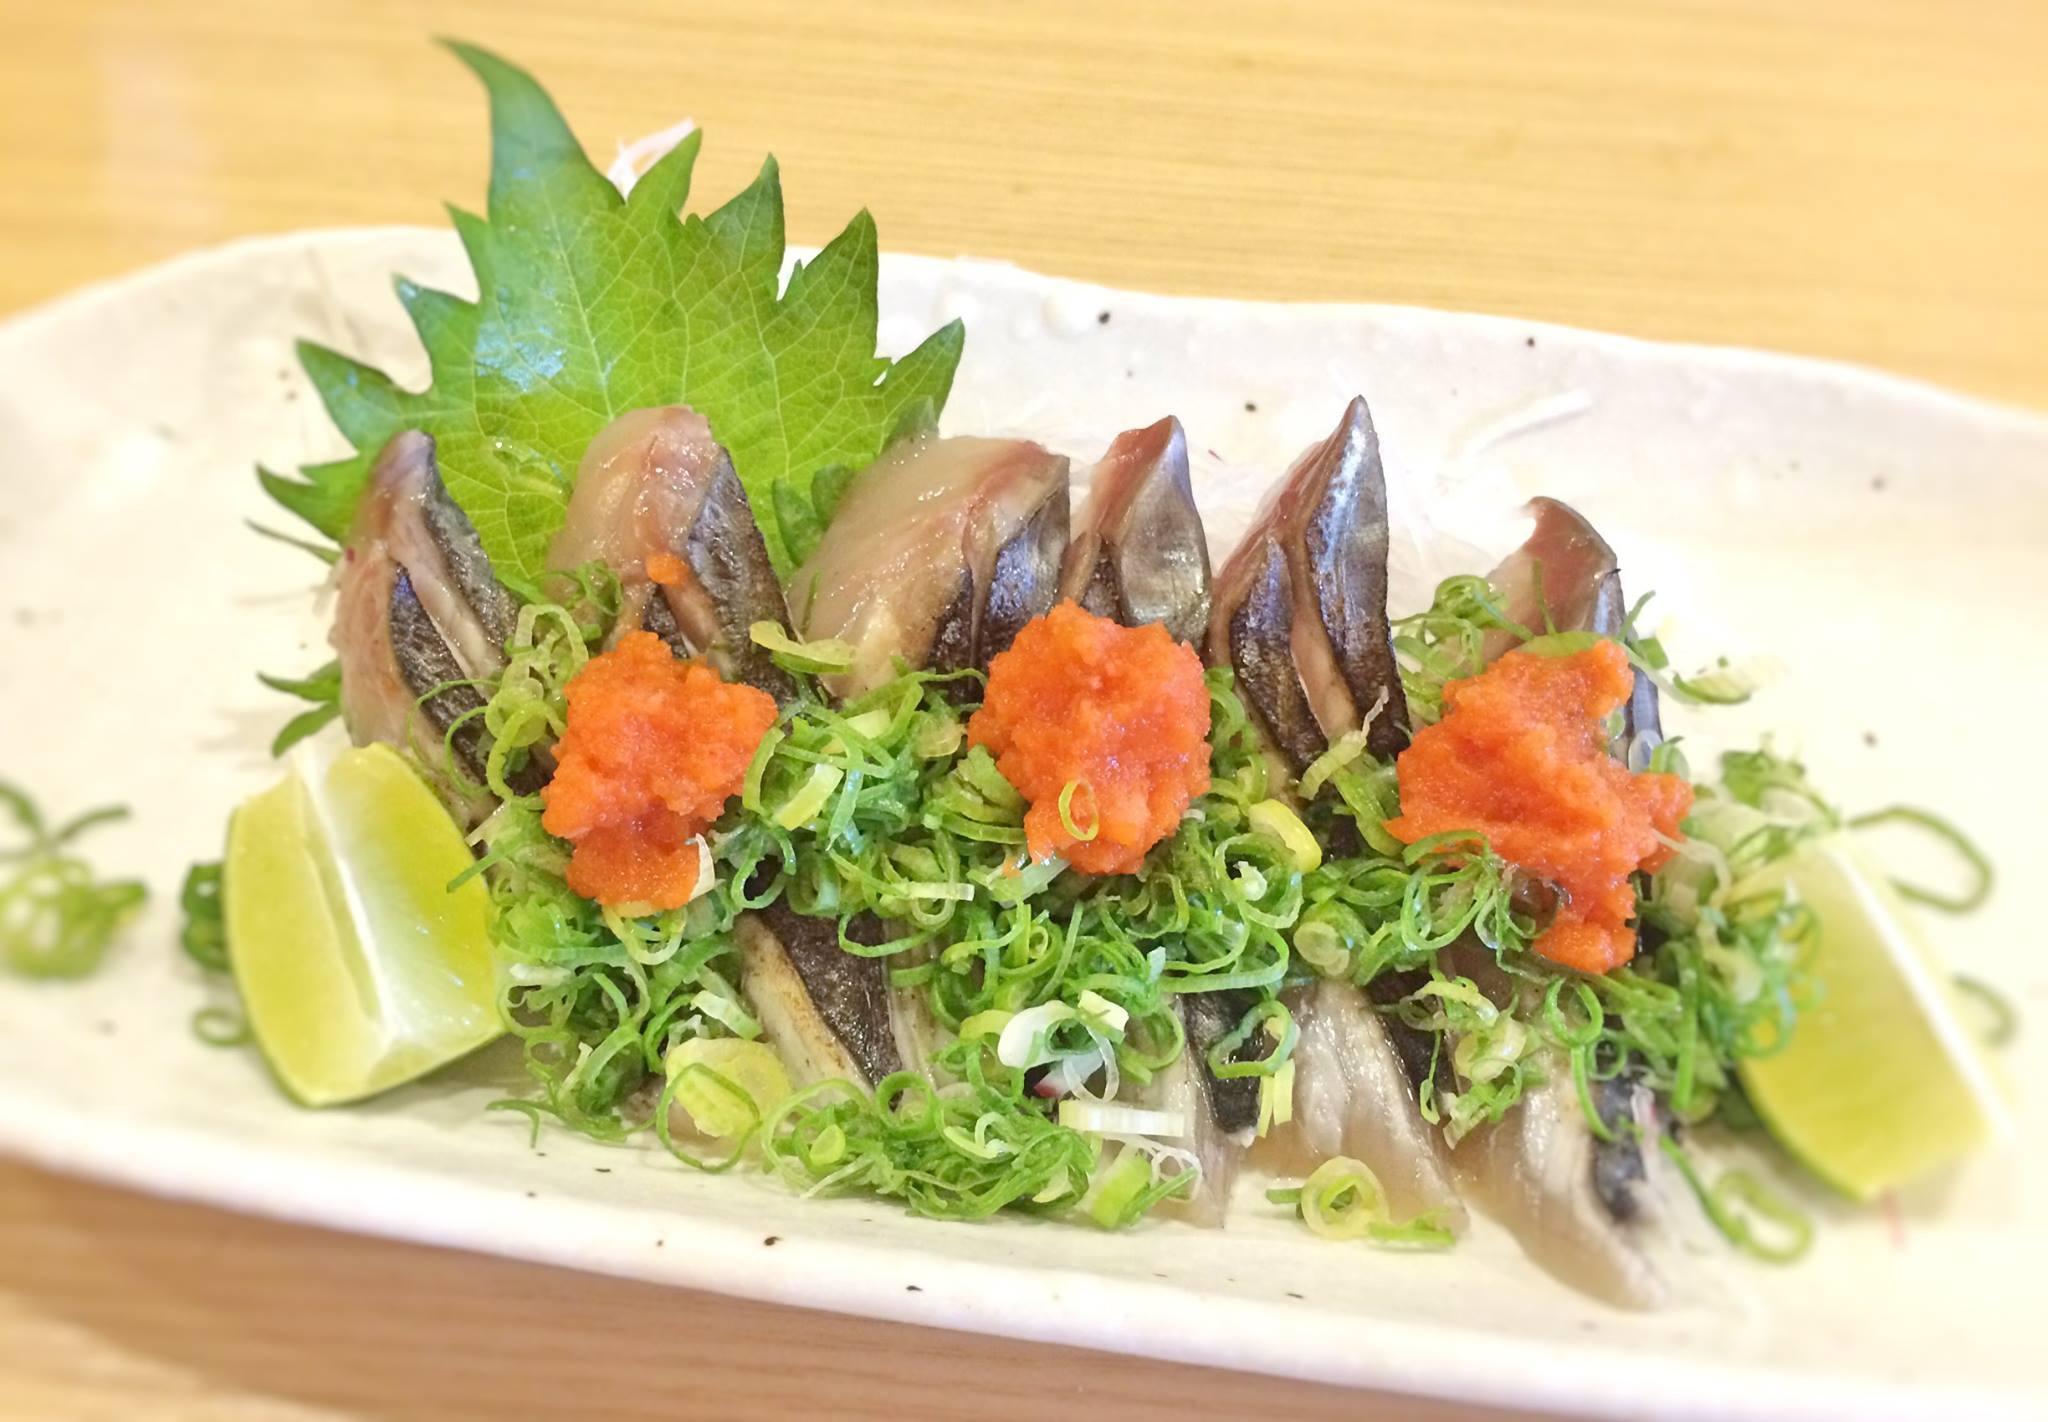 Inaba Restaurant The Best Restaurants in Honolulu